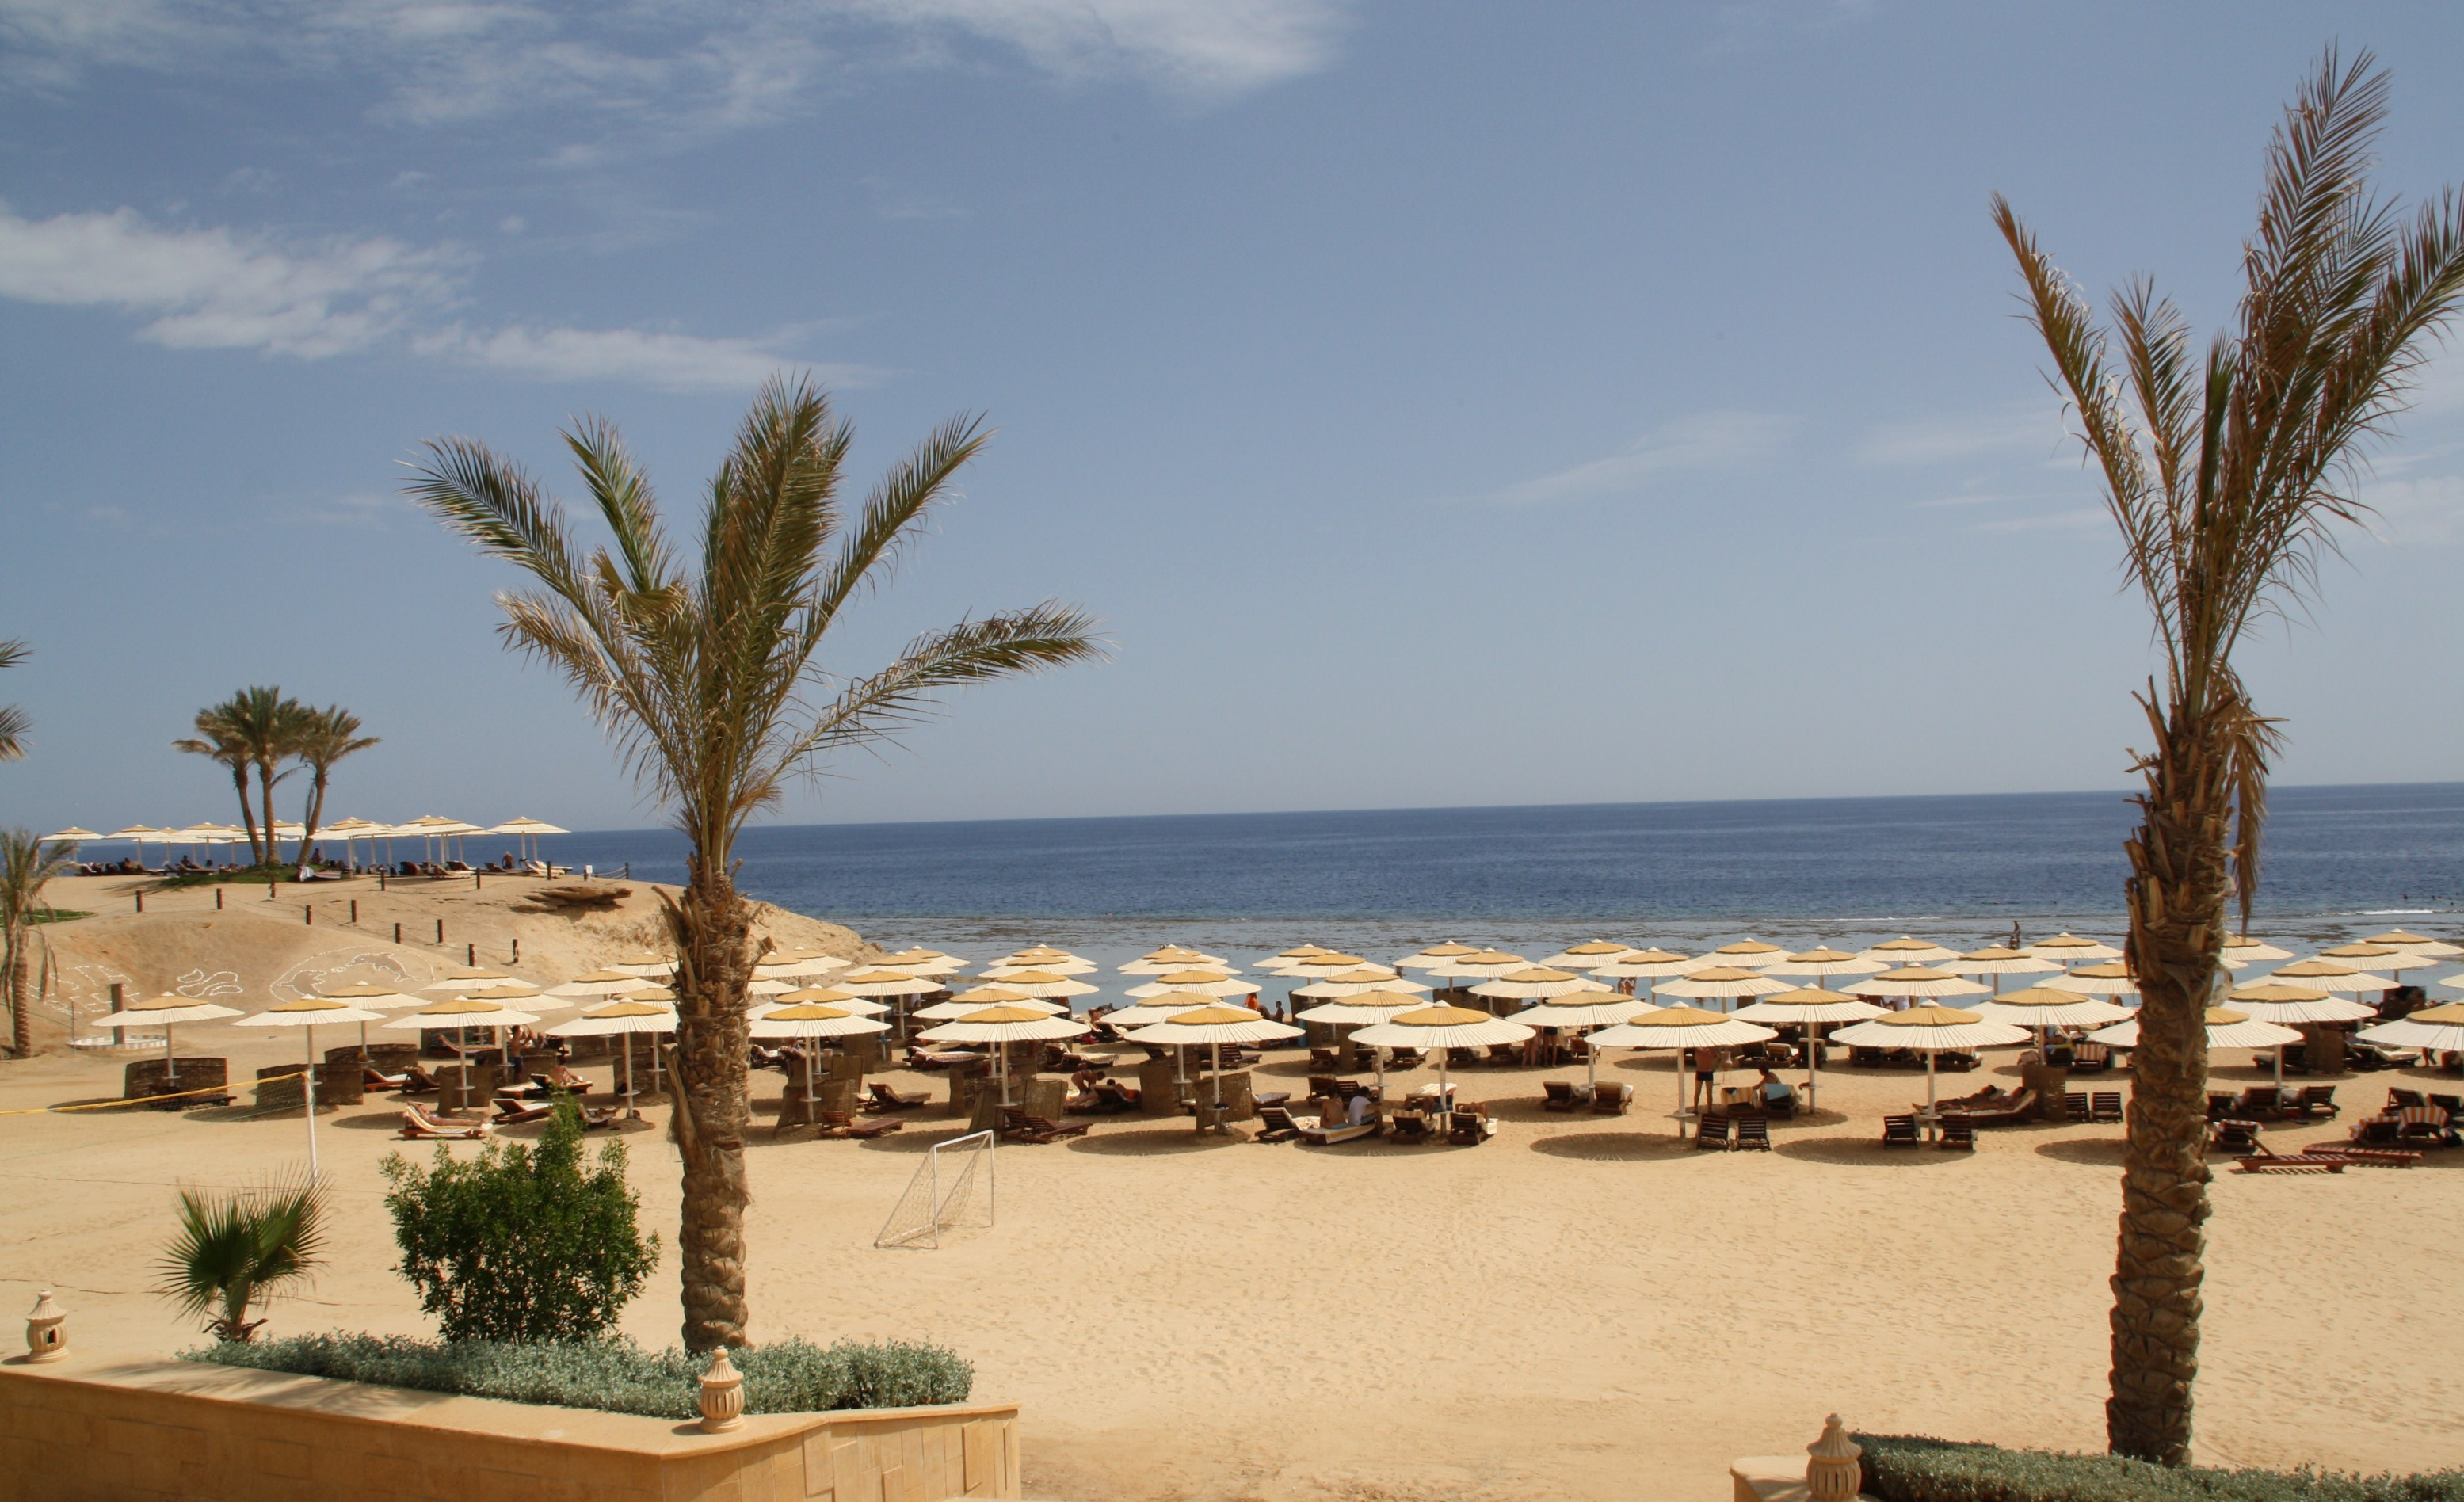 ROULETTE HOTEL 4*SUNEO CLUB REEF/THREE CORNER SEA B. *S.AI* | Marsa Alam